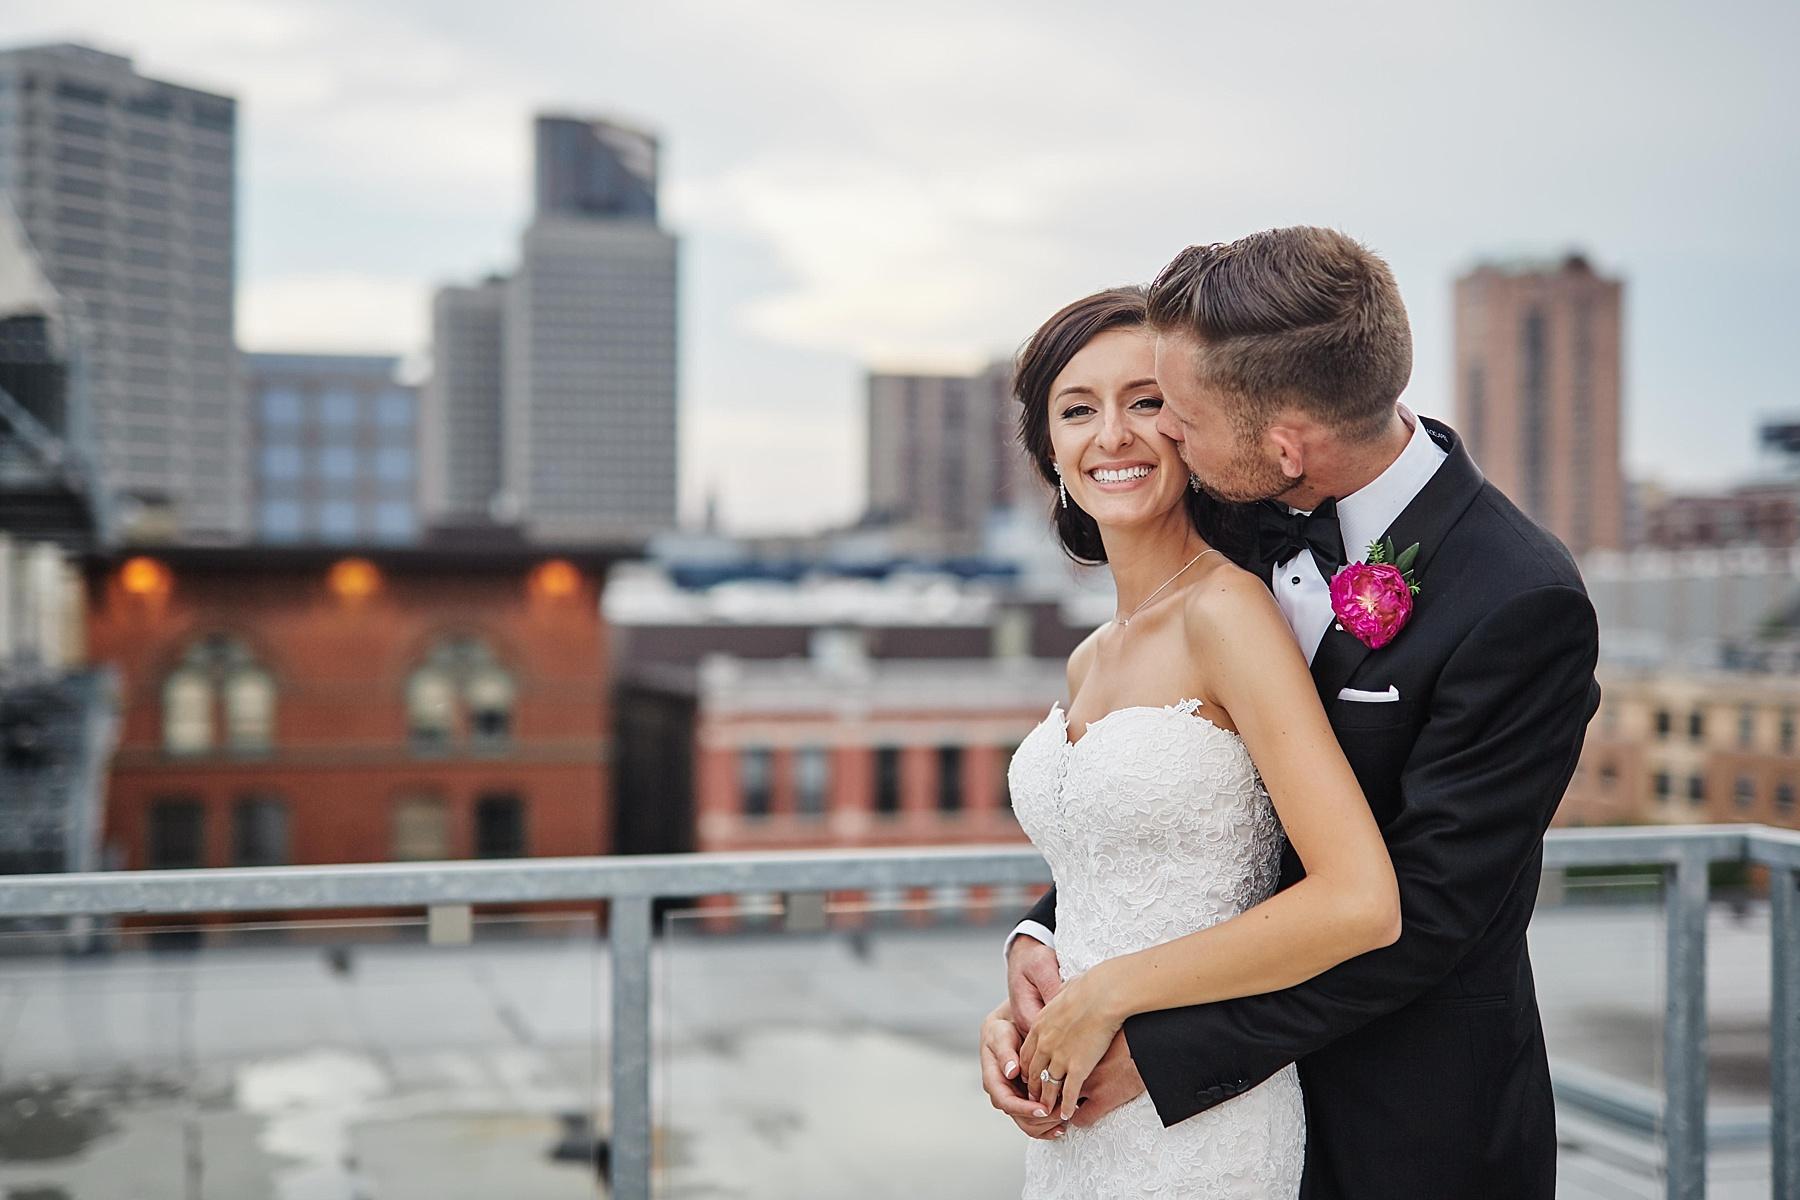 ABULAE-Wedding-Saint-paul-MN-Josh-Sofia-Wedding-Mears-Park_0820.jpg